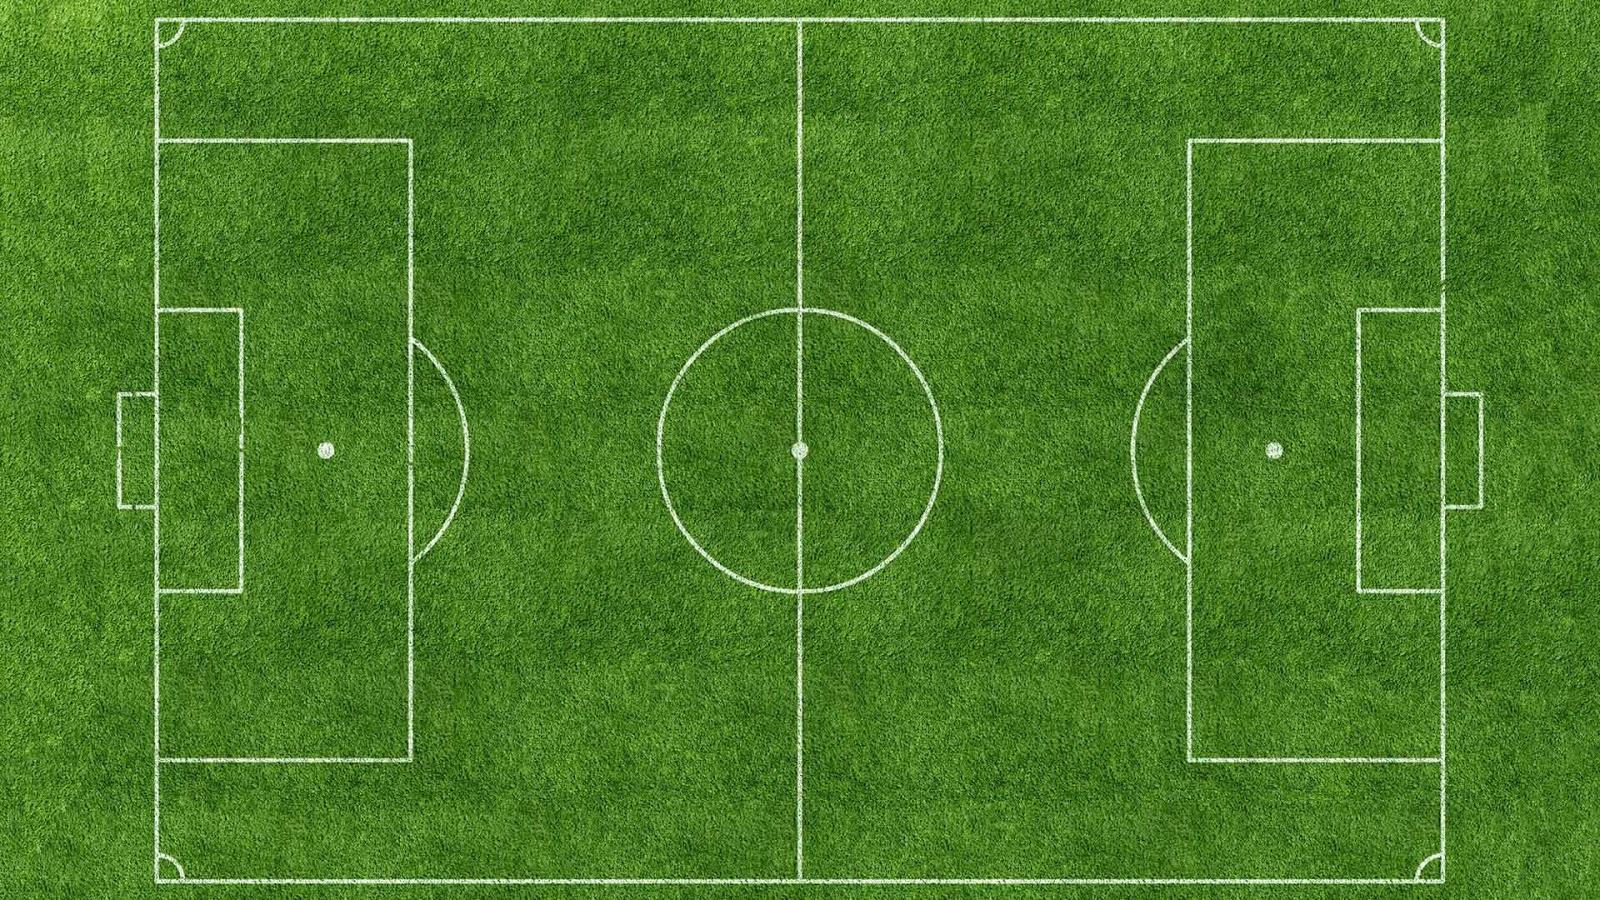 Fondo De Pantalla Linda Futbol: Livescore Livescore Today Football Score